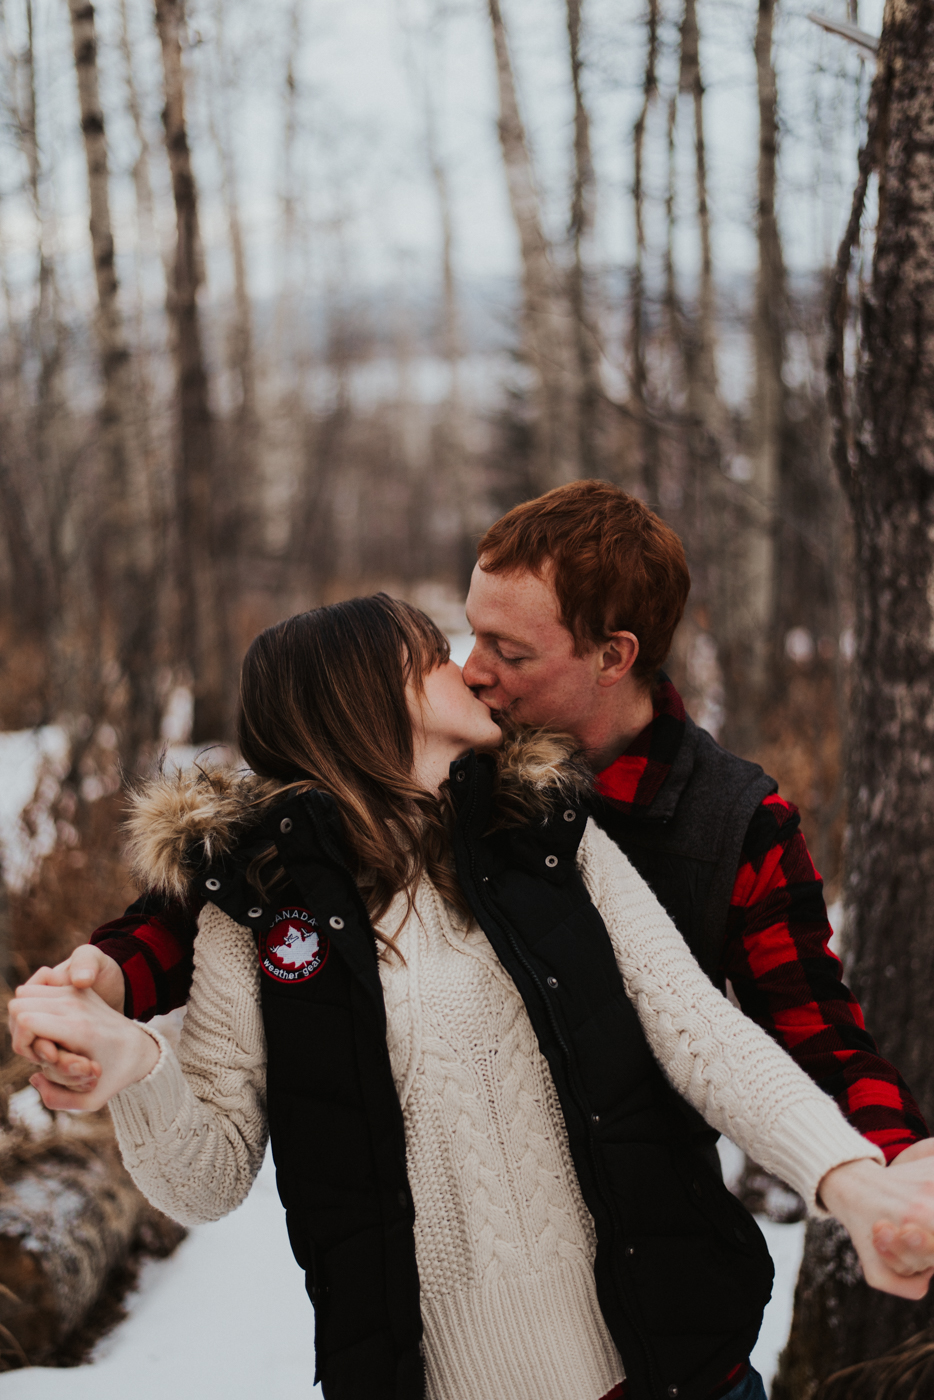 FortSt.John_photographer_TyraEPhotography_Wedding_Couple_Family_Photograhy_DawsonCreek_Elopement_Bride_Boduoir_Portraits-7533.jpg